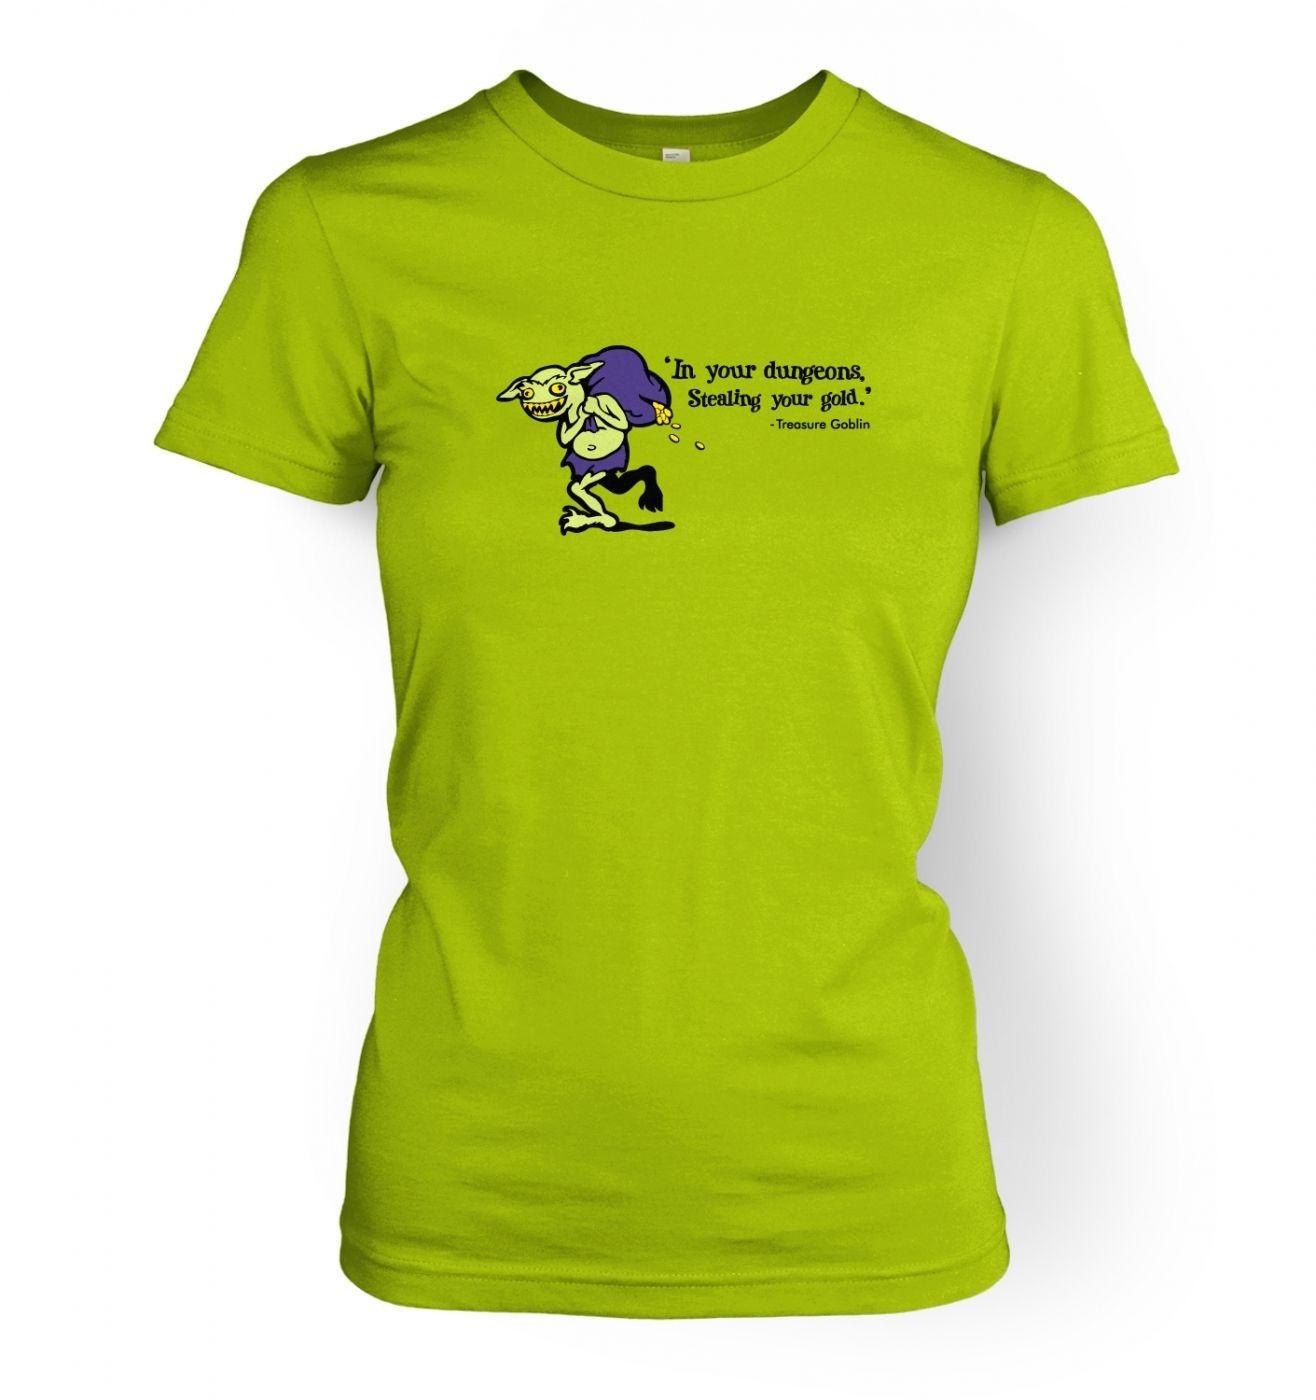 Treasure Goblin women's fitted t-shirt